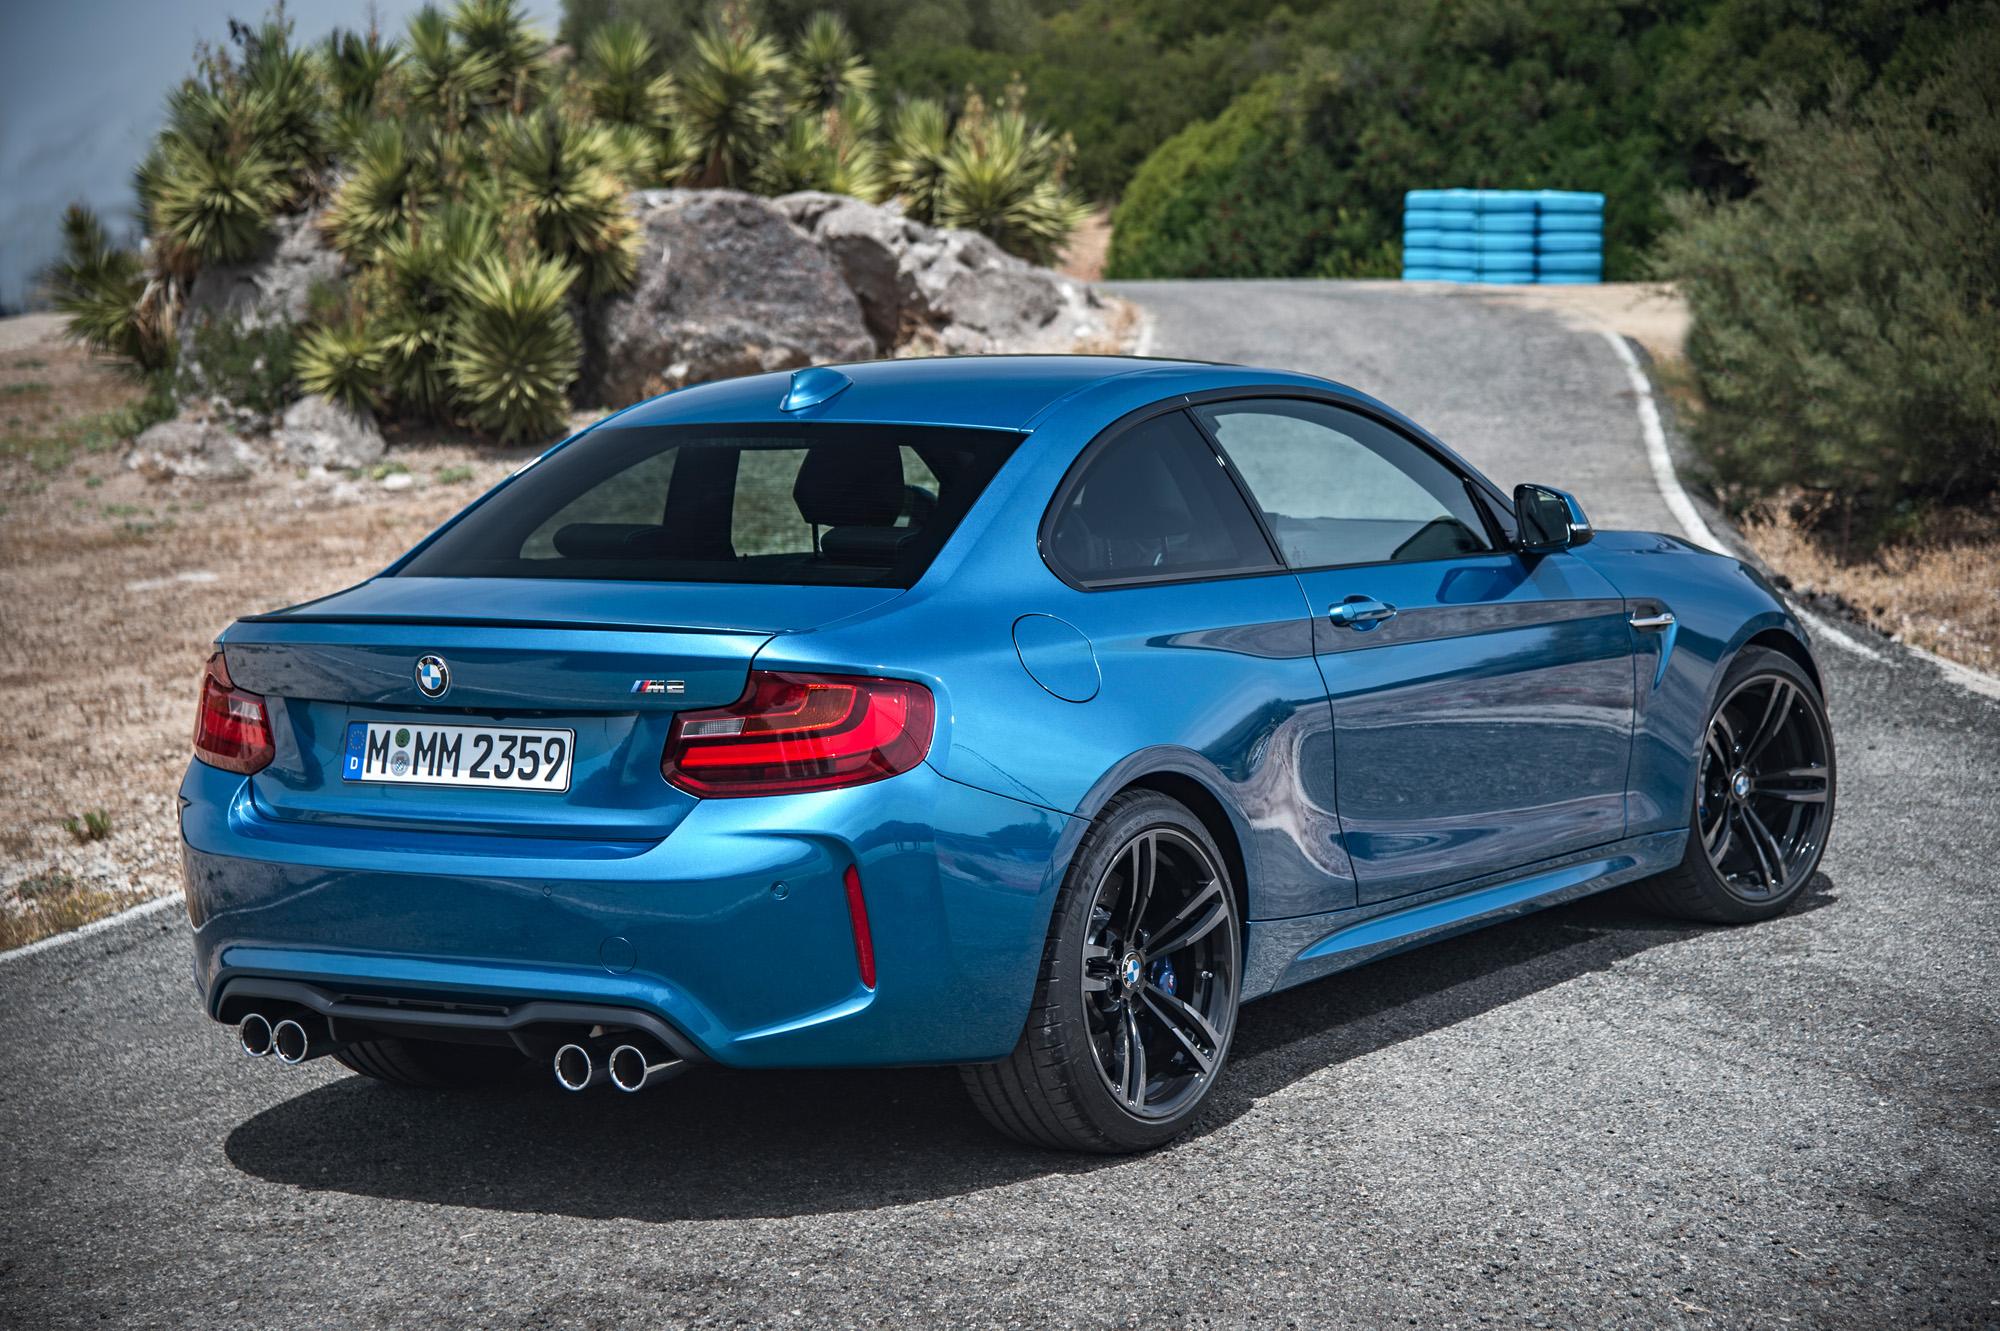 Kickstartfreude im BMW M2 Coupé